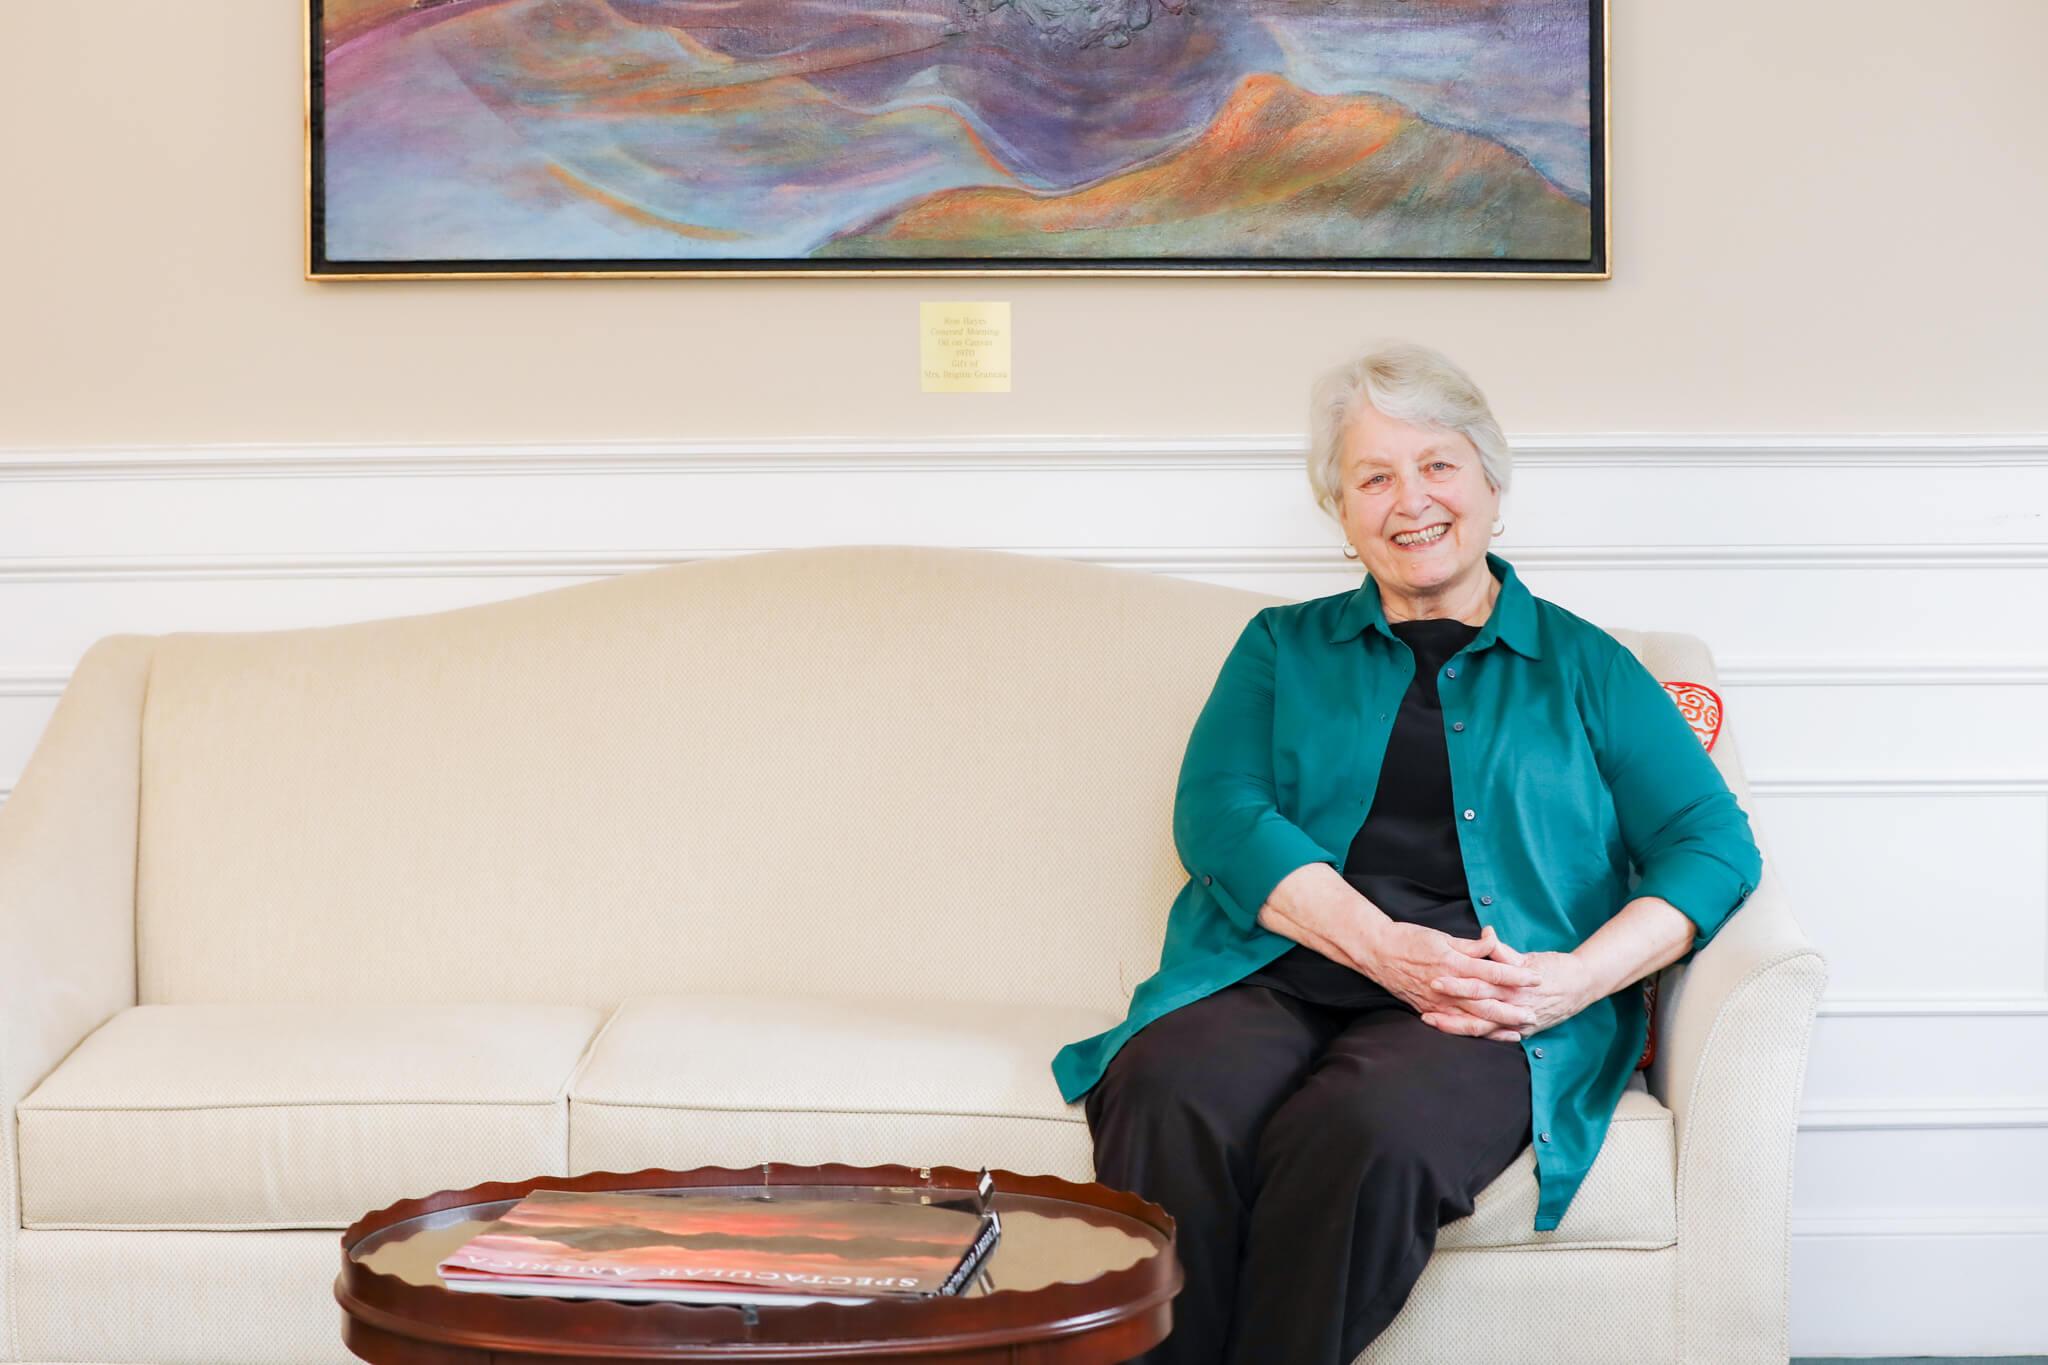 Marcia Bradley Sitting on Couch